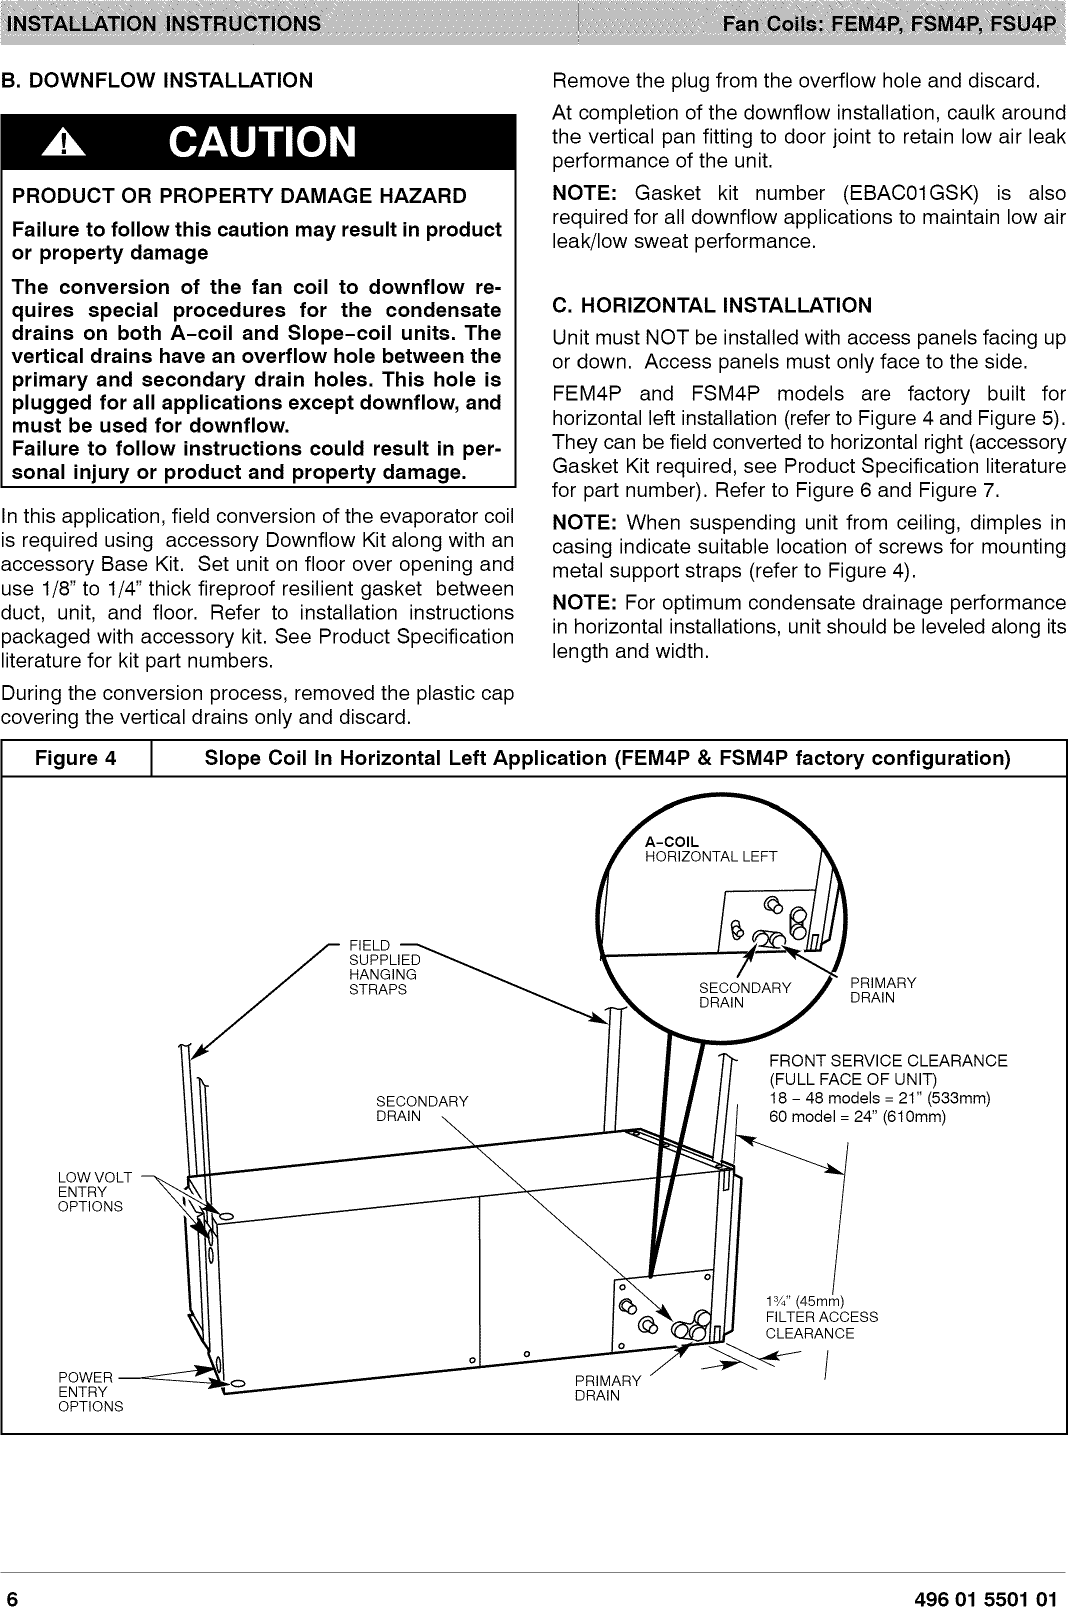 Fem4p3000a Icp Wiring Diagram. . Wiring Diagram on